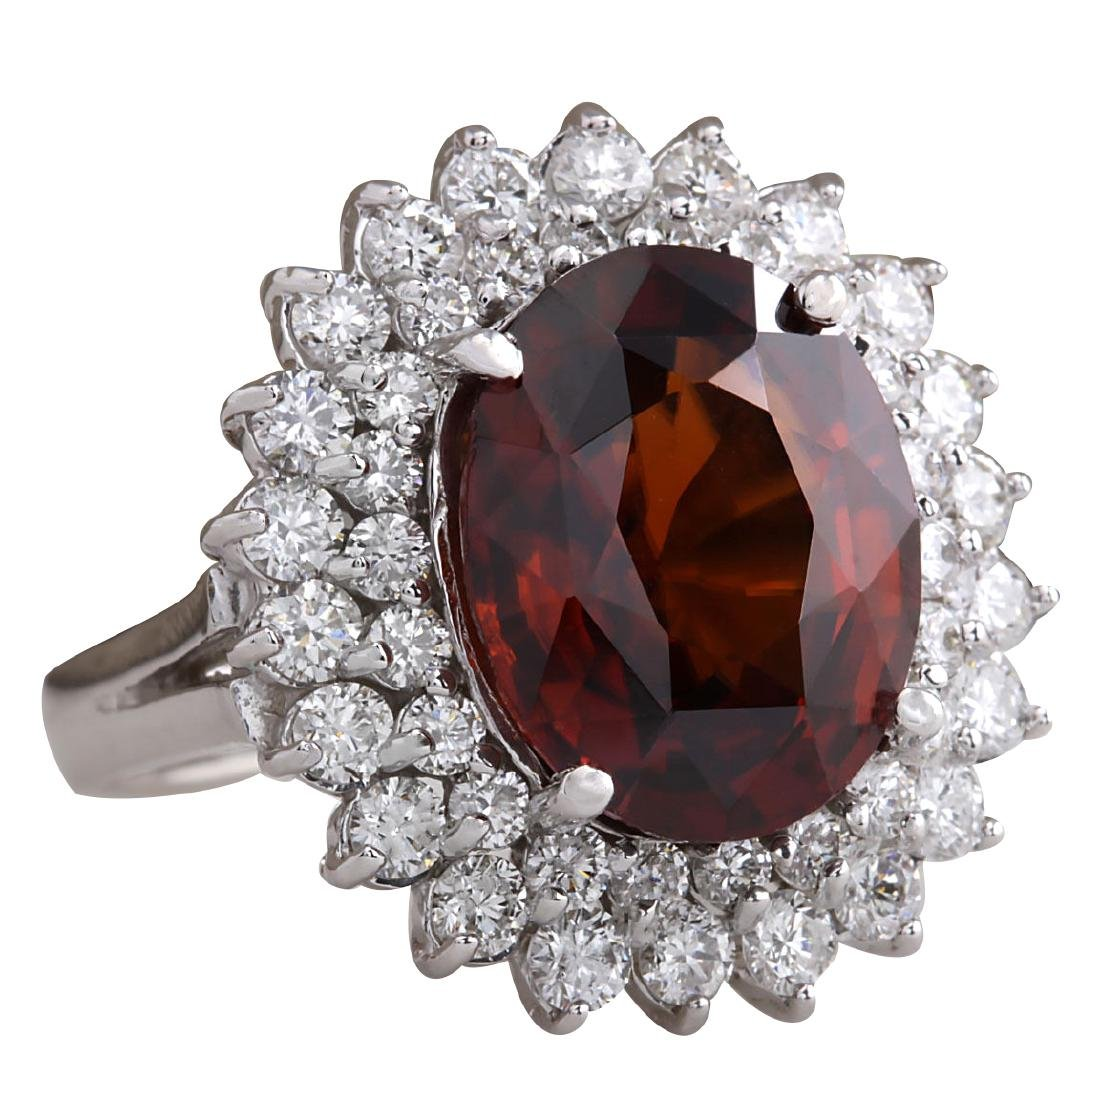 11.01CTW Natural Hessonite Garnet And Diamond Ring 18K - 2